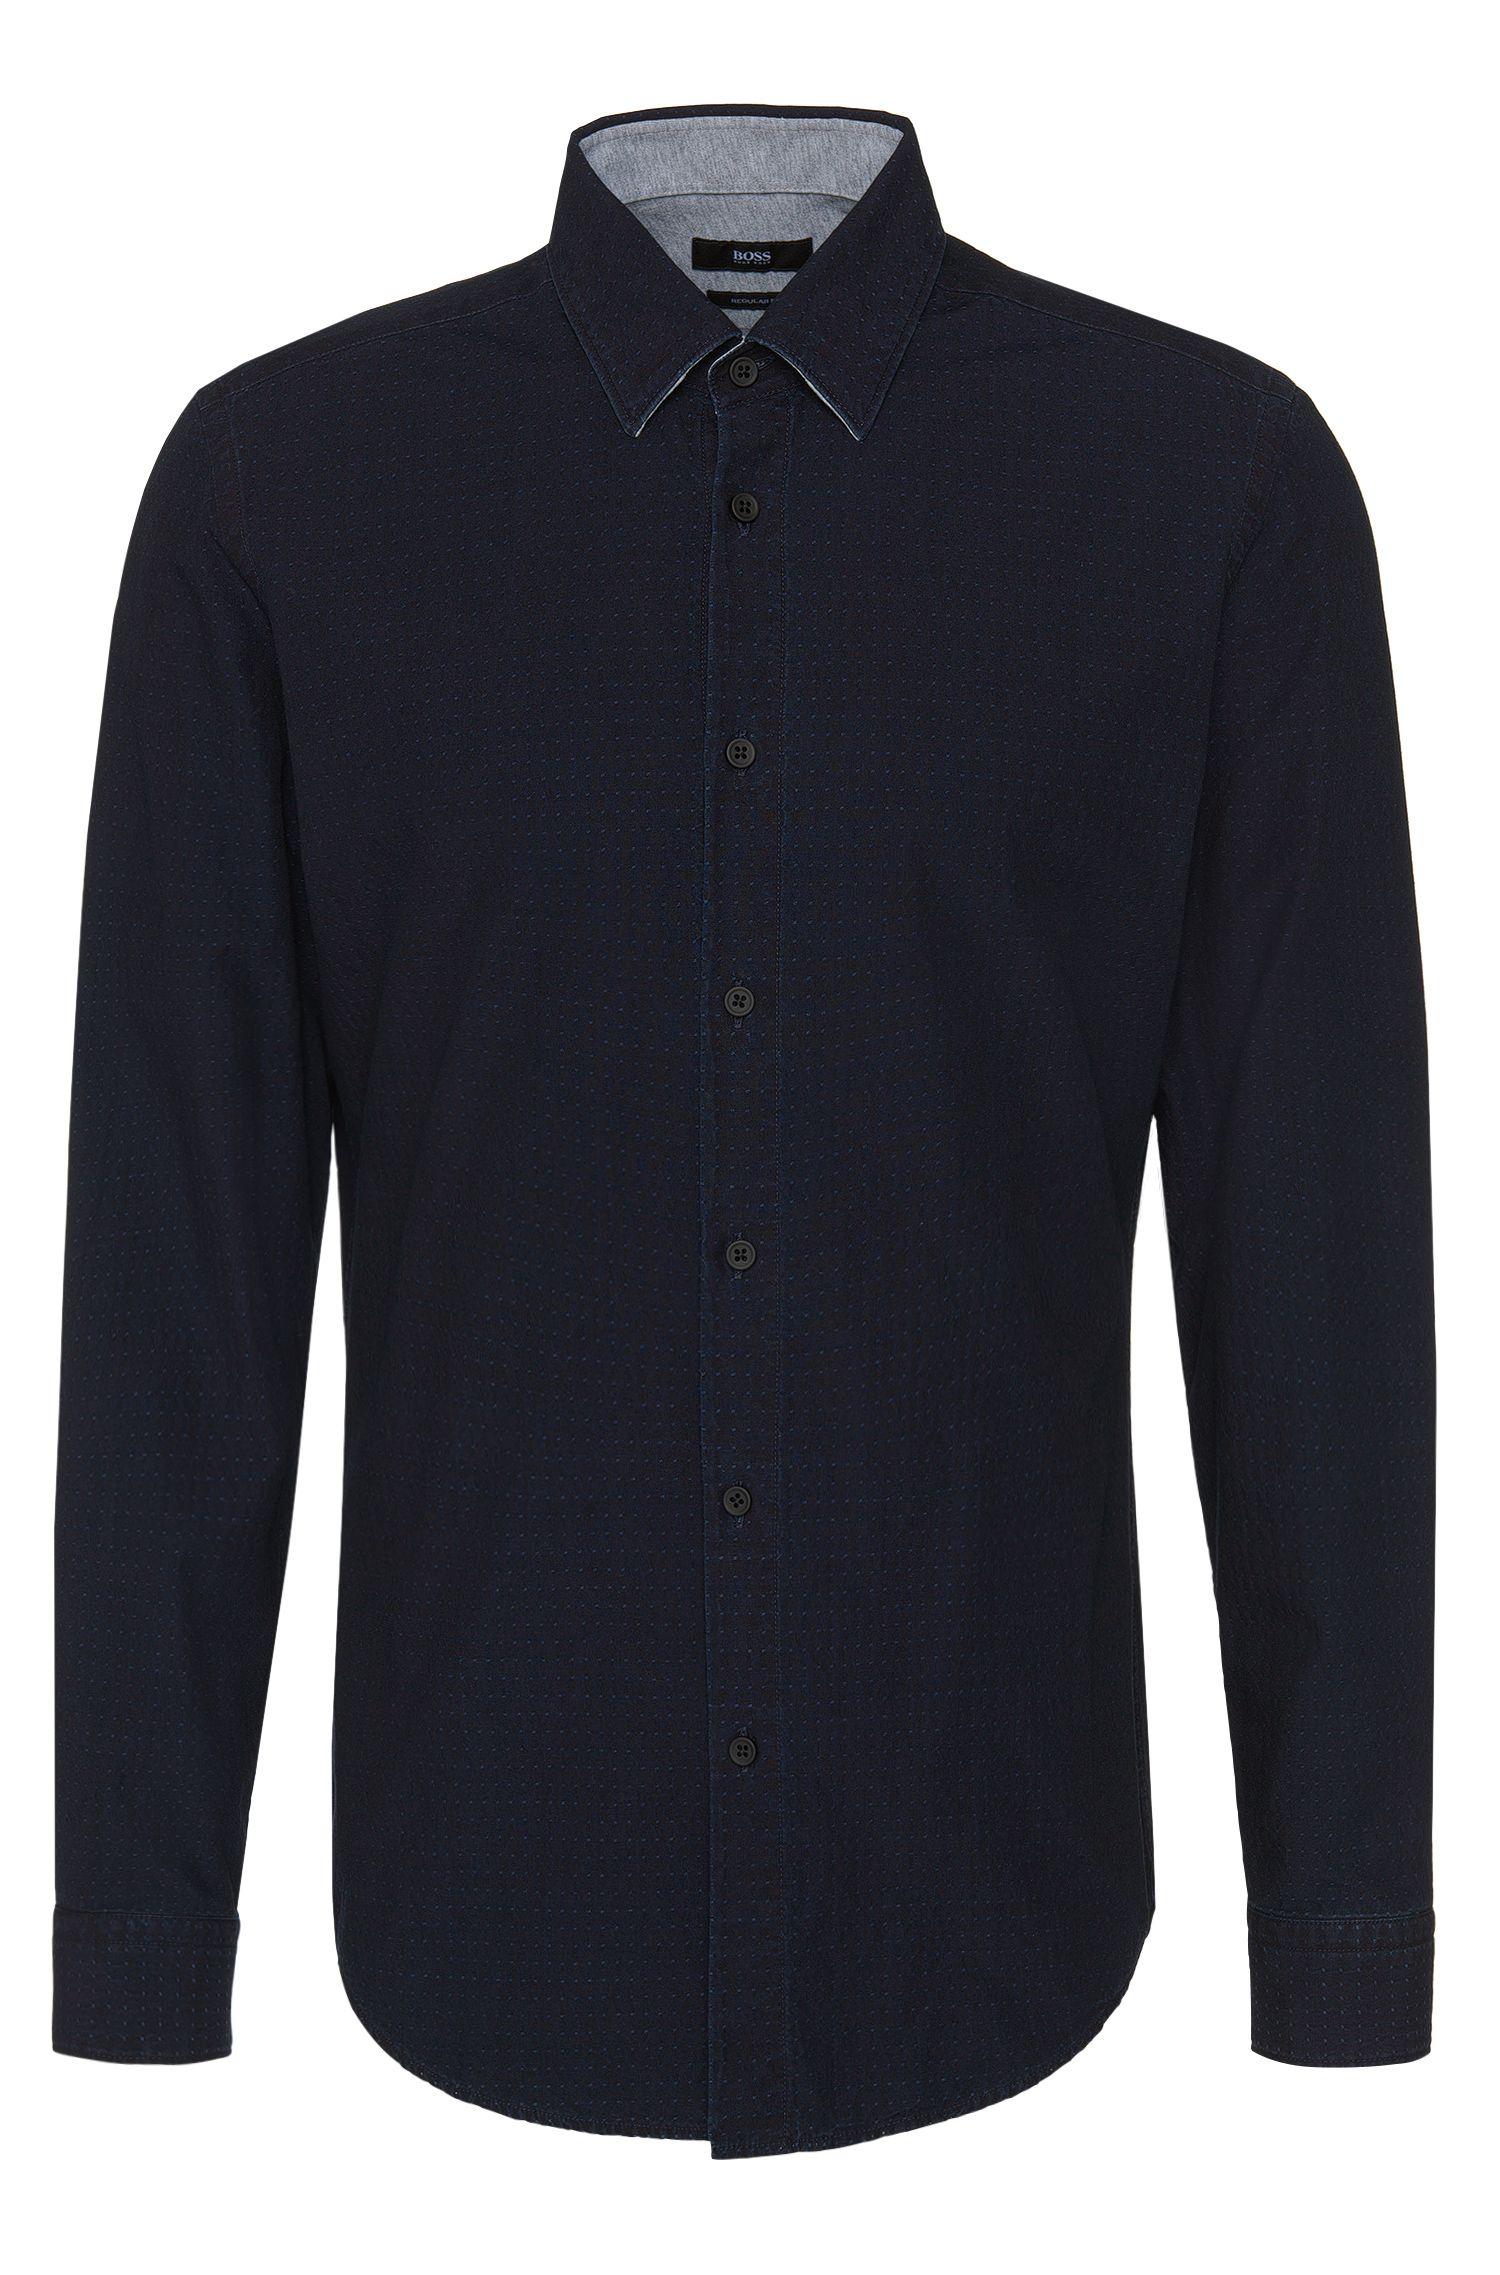 'Loreno'   Regular Fit, Cotton Embroidered Button Down Shirt